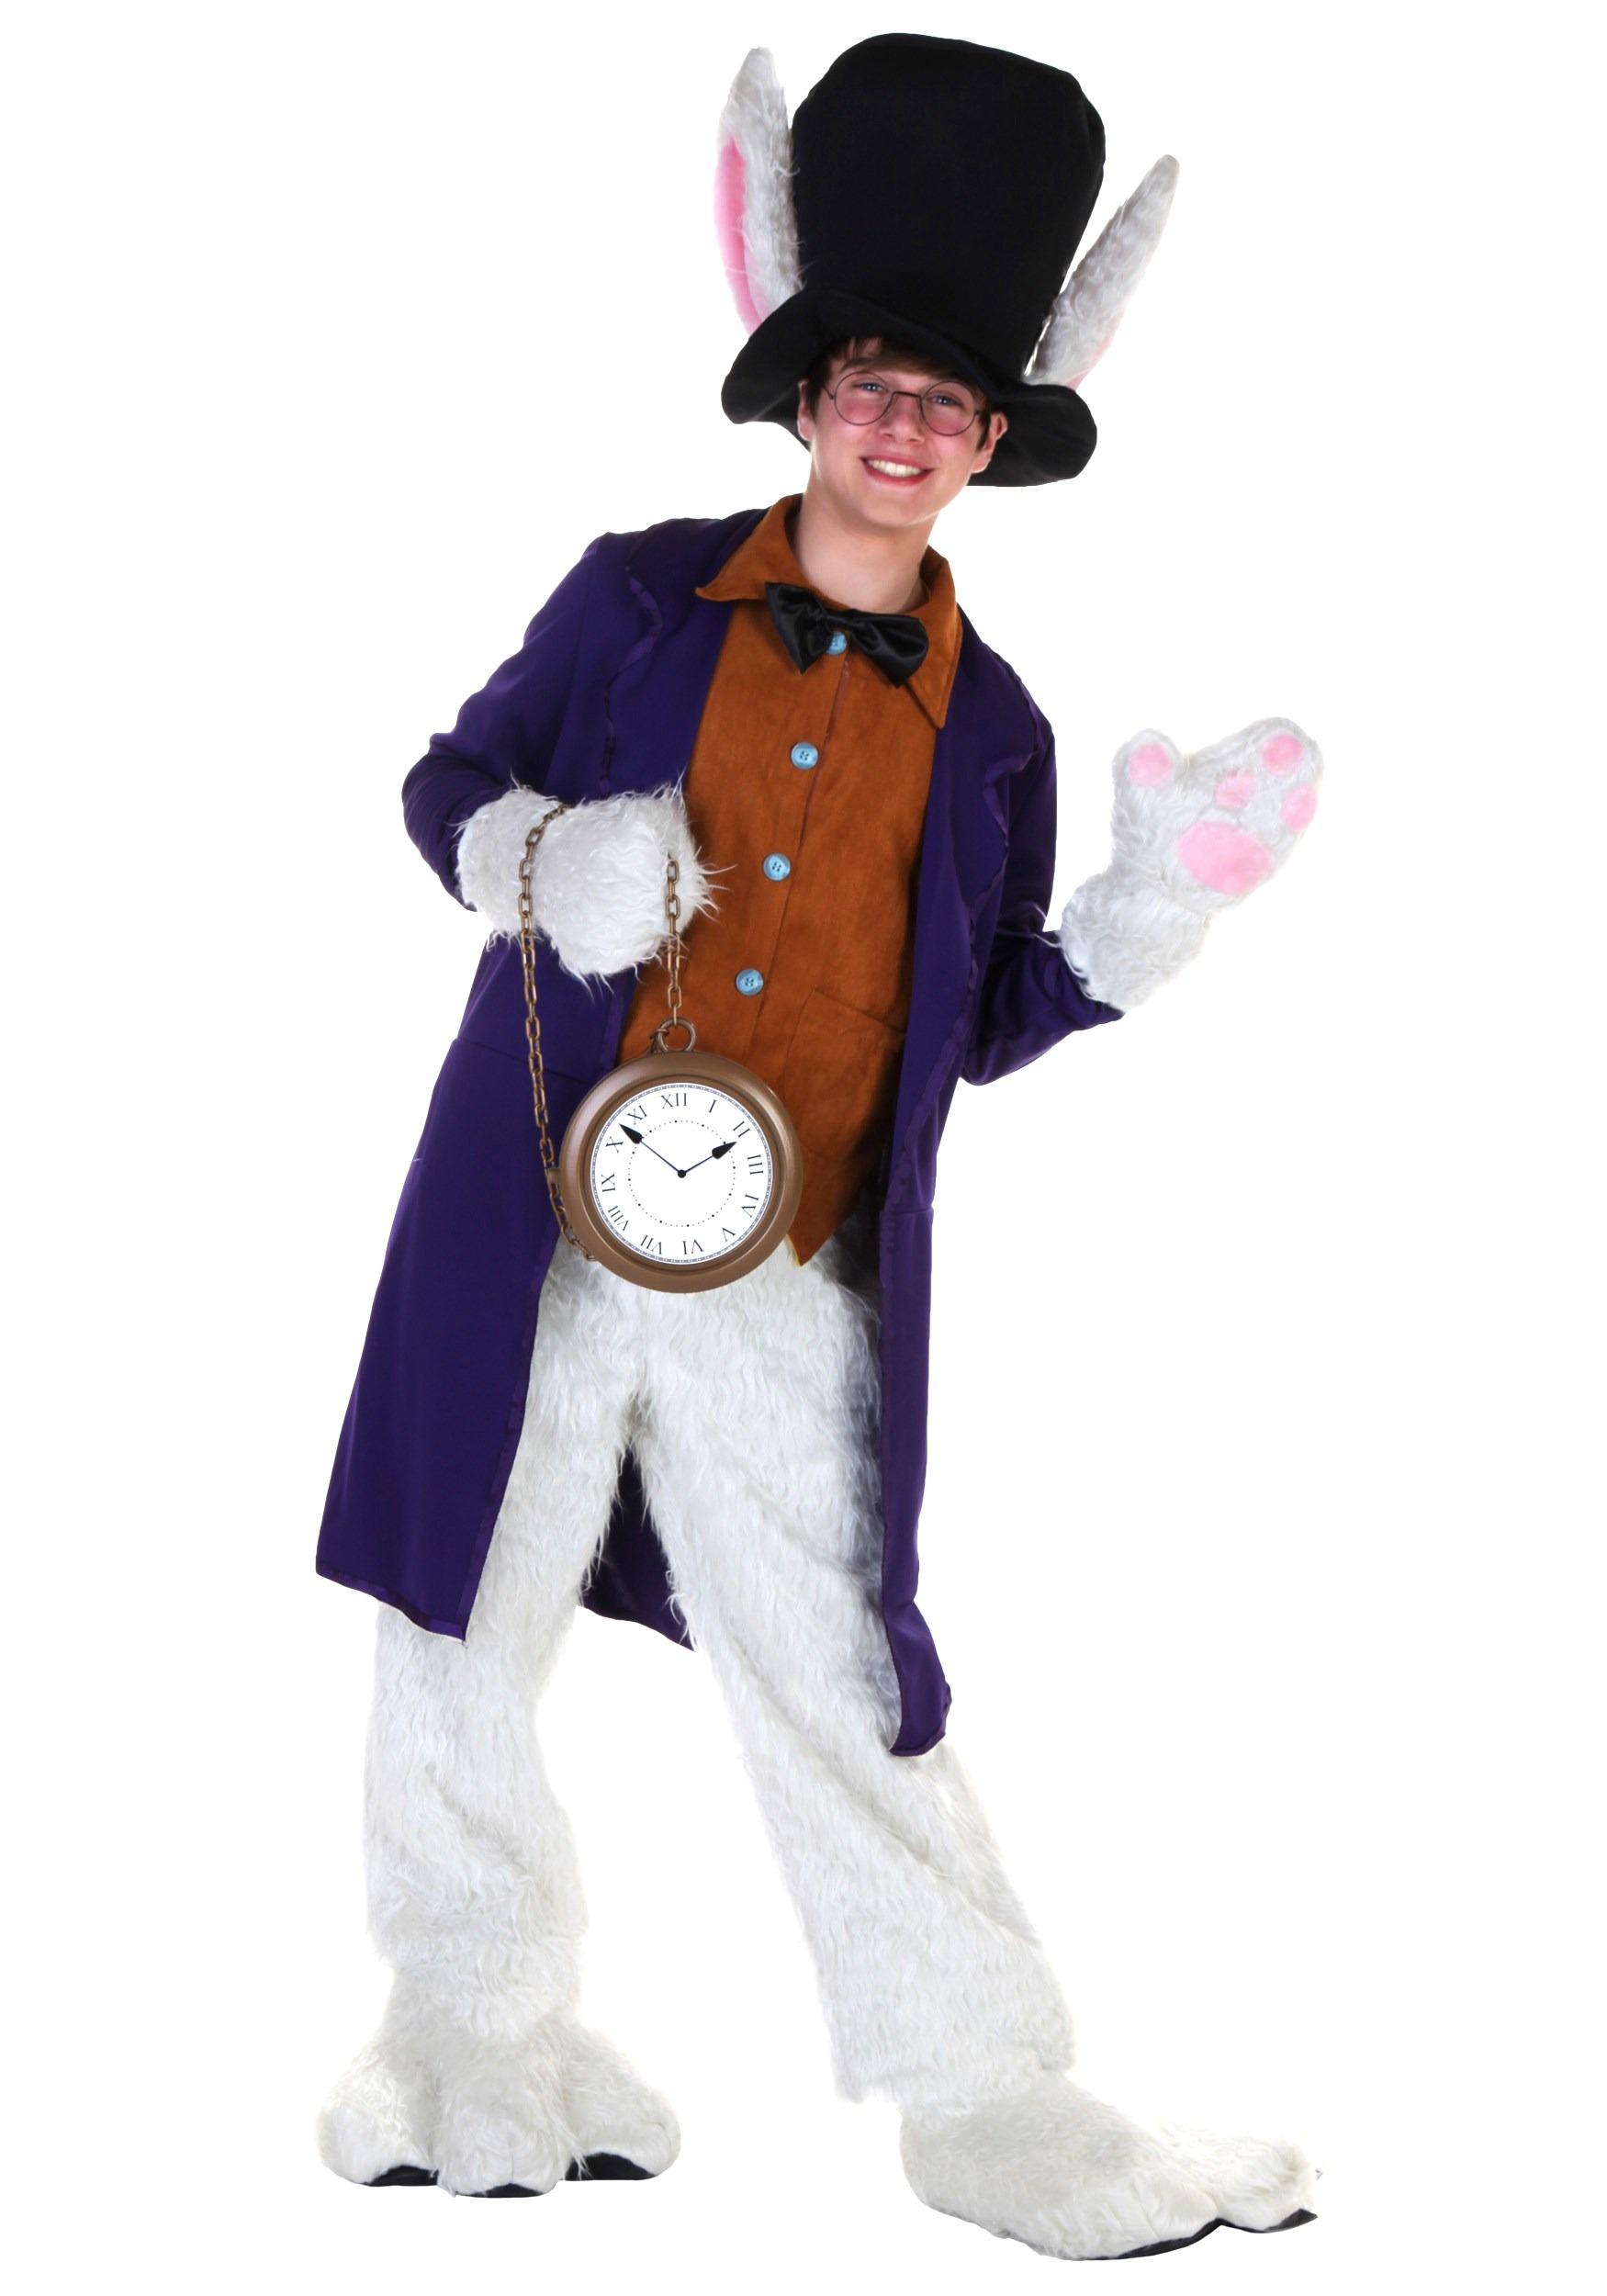 Alice in bunny costume and stockings masturbating 5